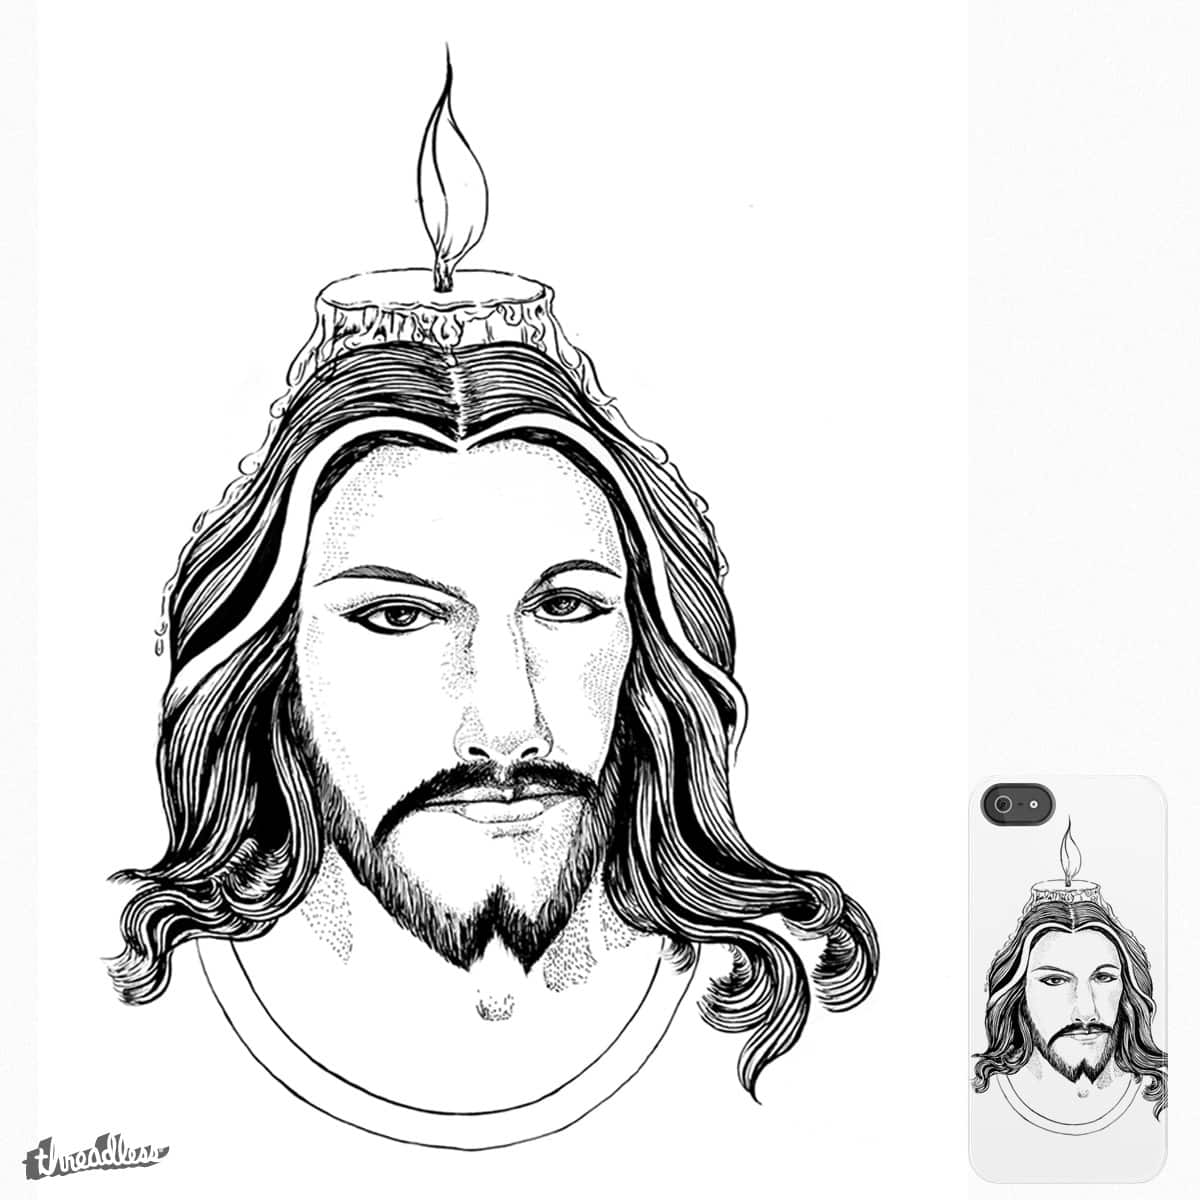 JESUS CHRIST by aspdesigns on Threadless